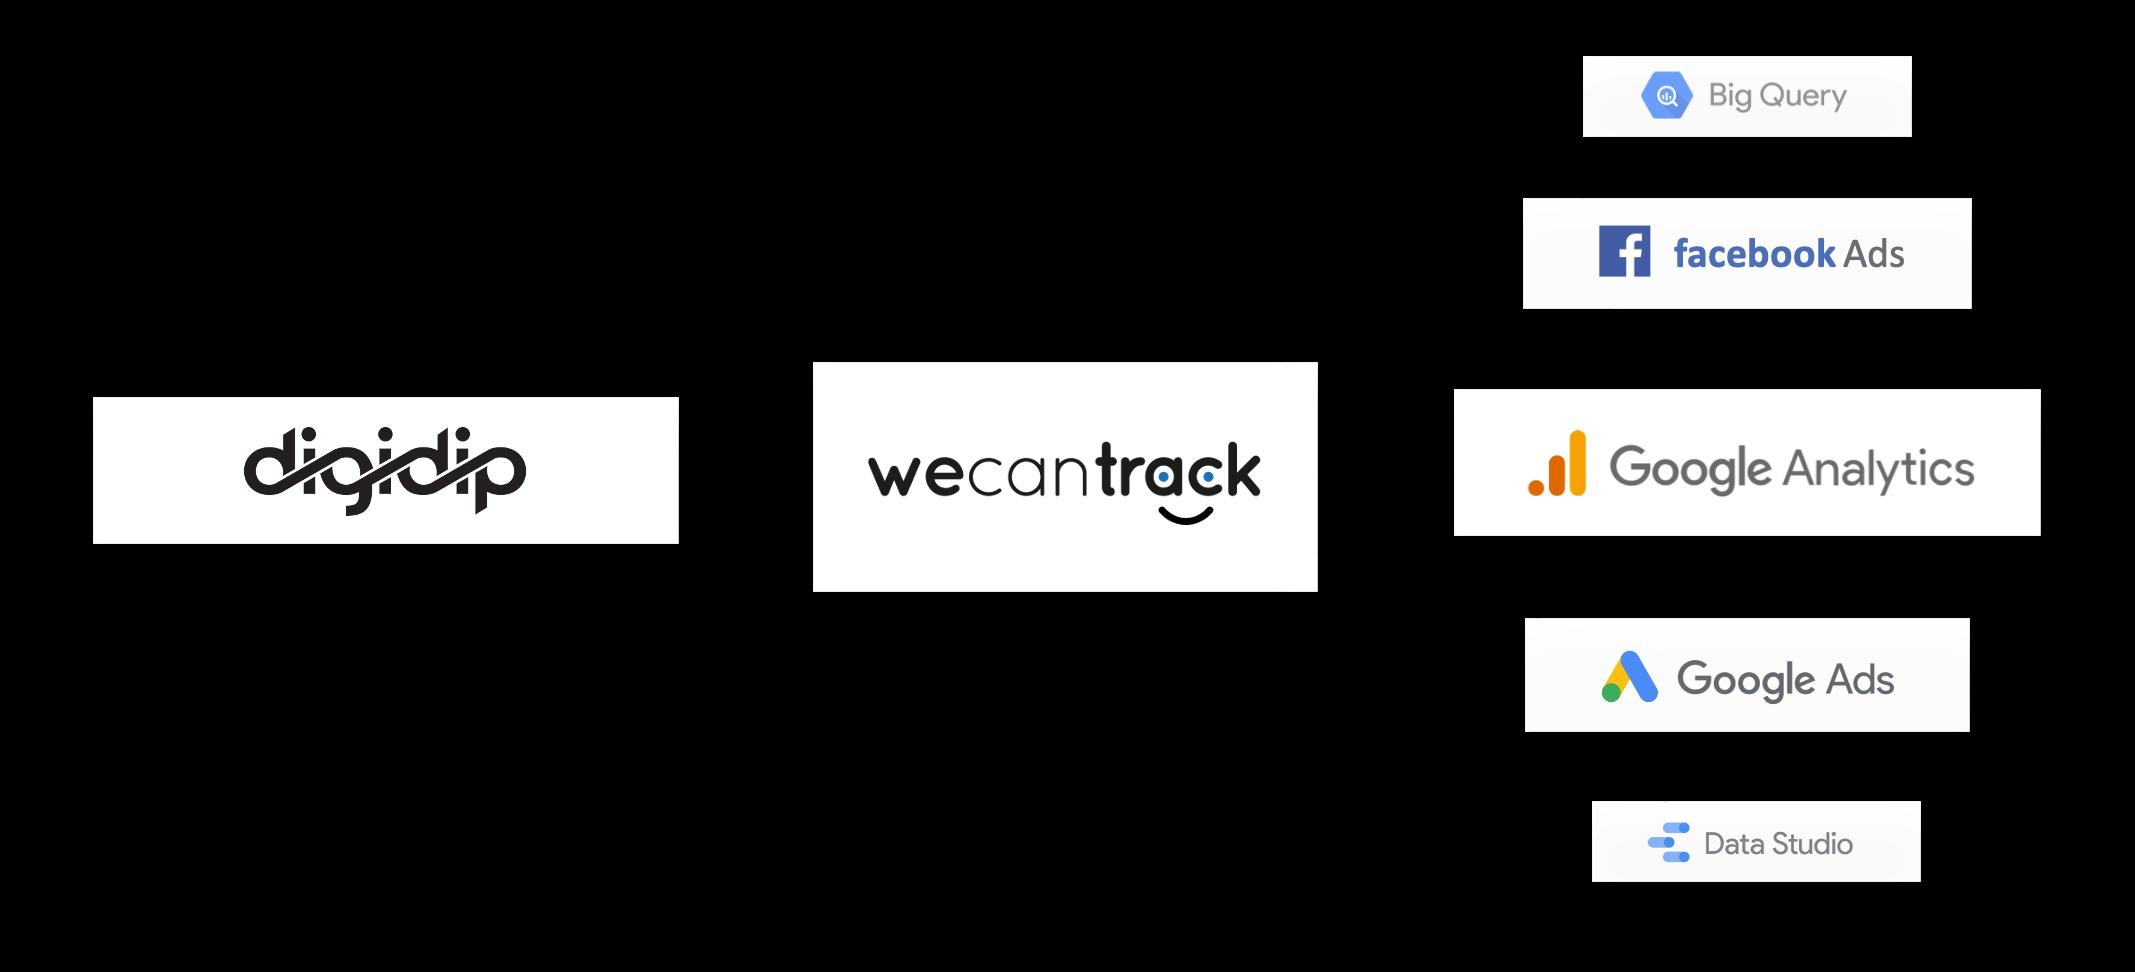 digidip-affiliate-conversion-integration-via-api